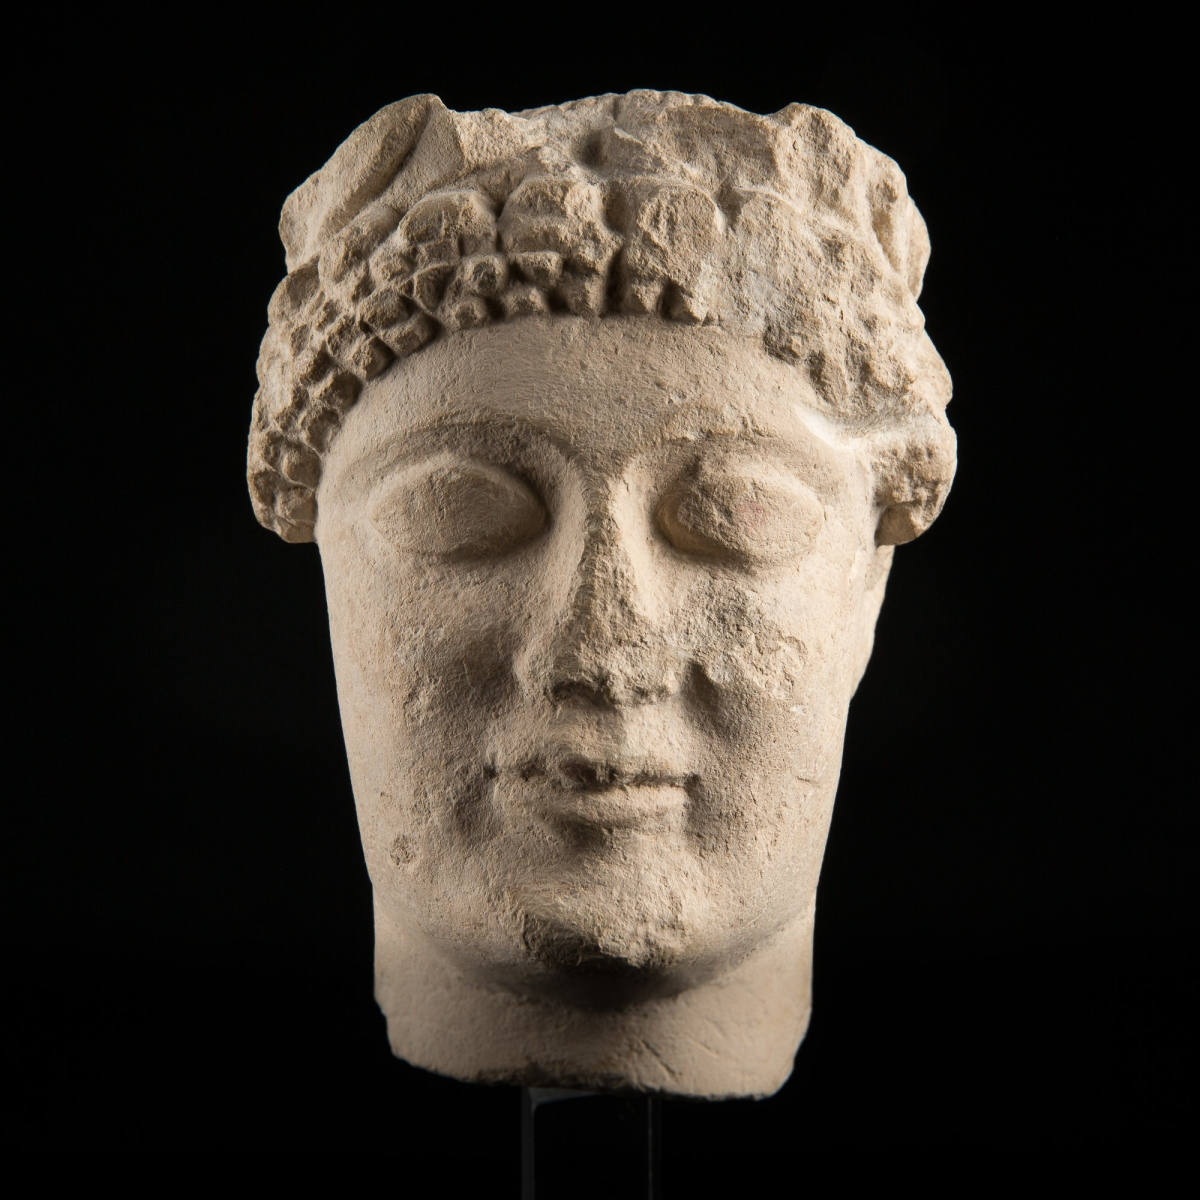 Photo of boston-fine-art-museum-chyprus-votive-head-collcetion-of-general-de-cesnola-galerie-golconda